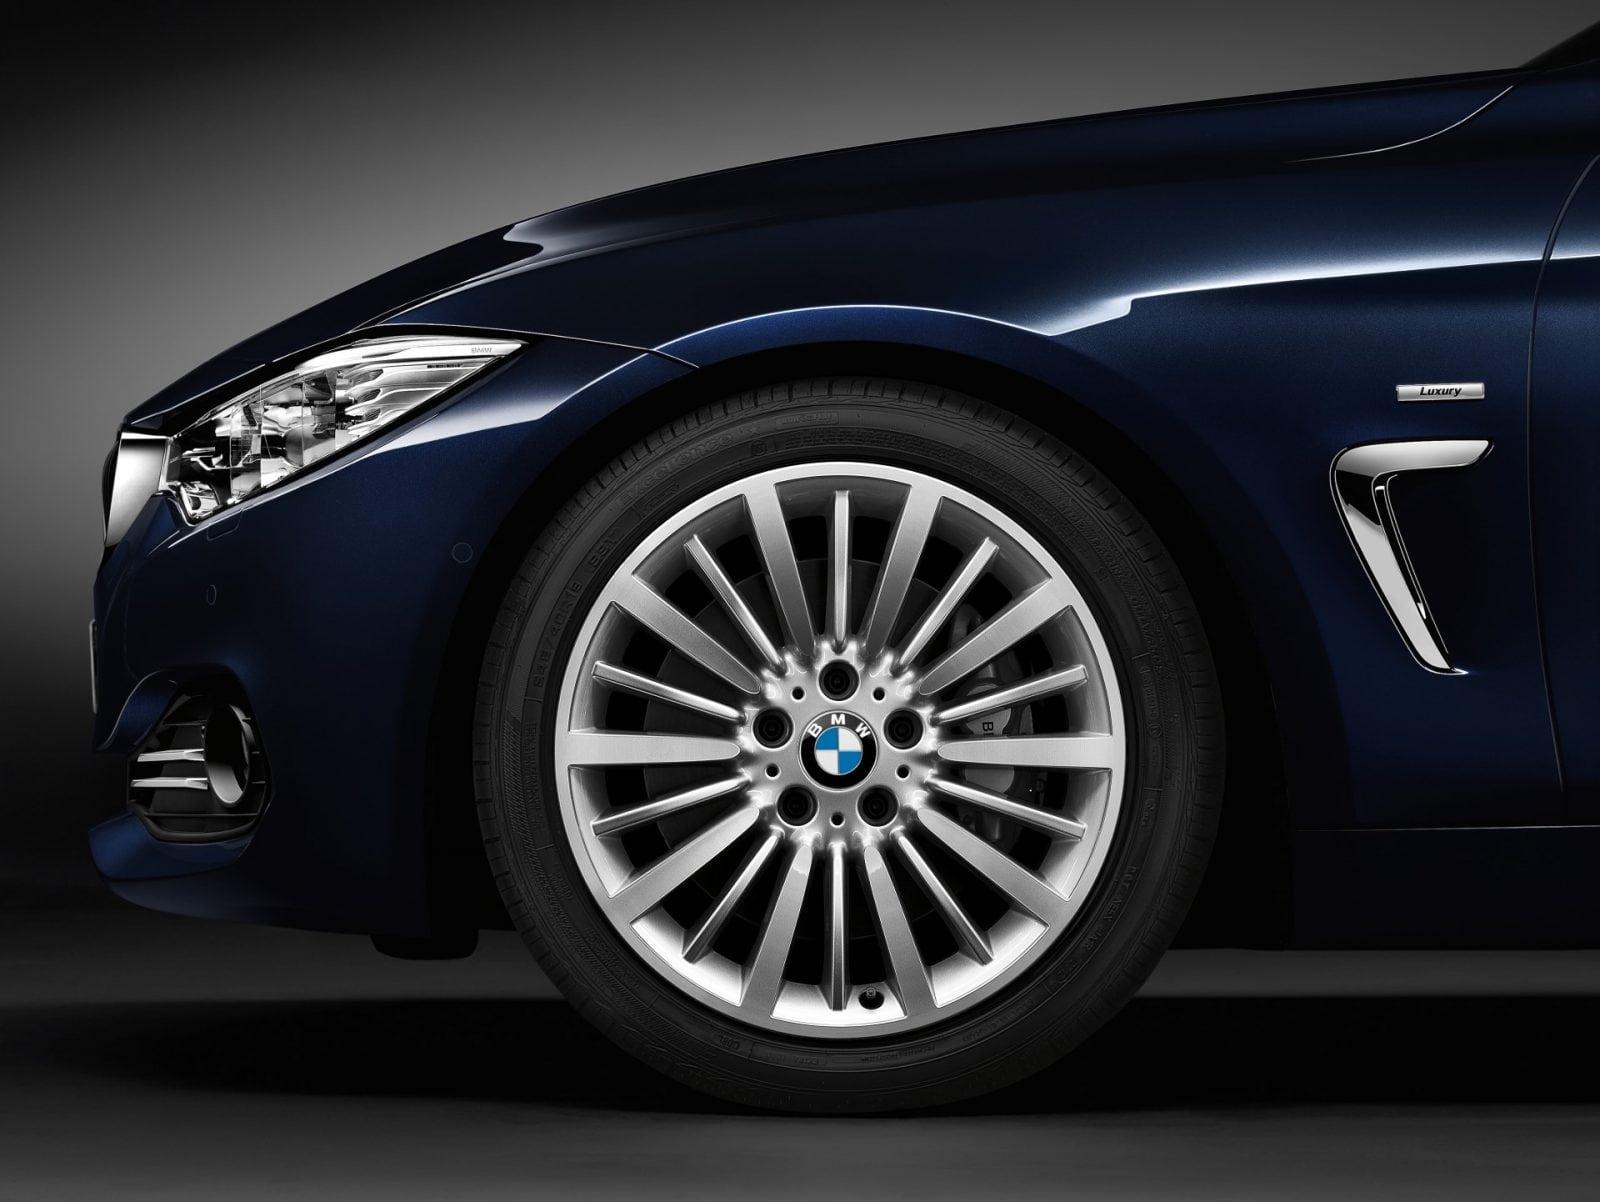 BMW 4 Series F32 Details